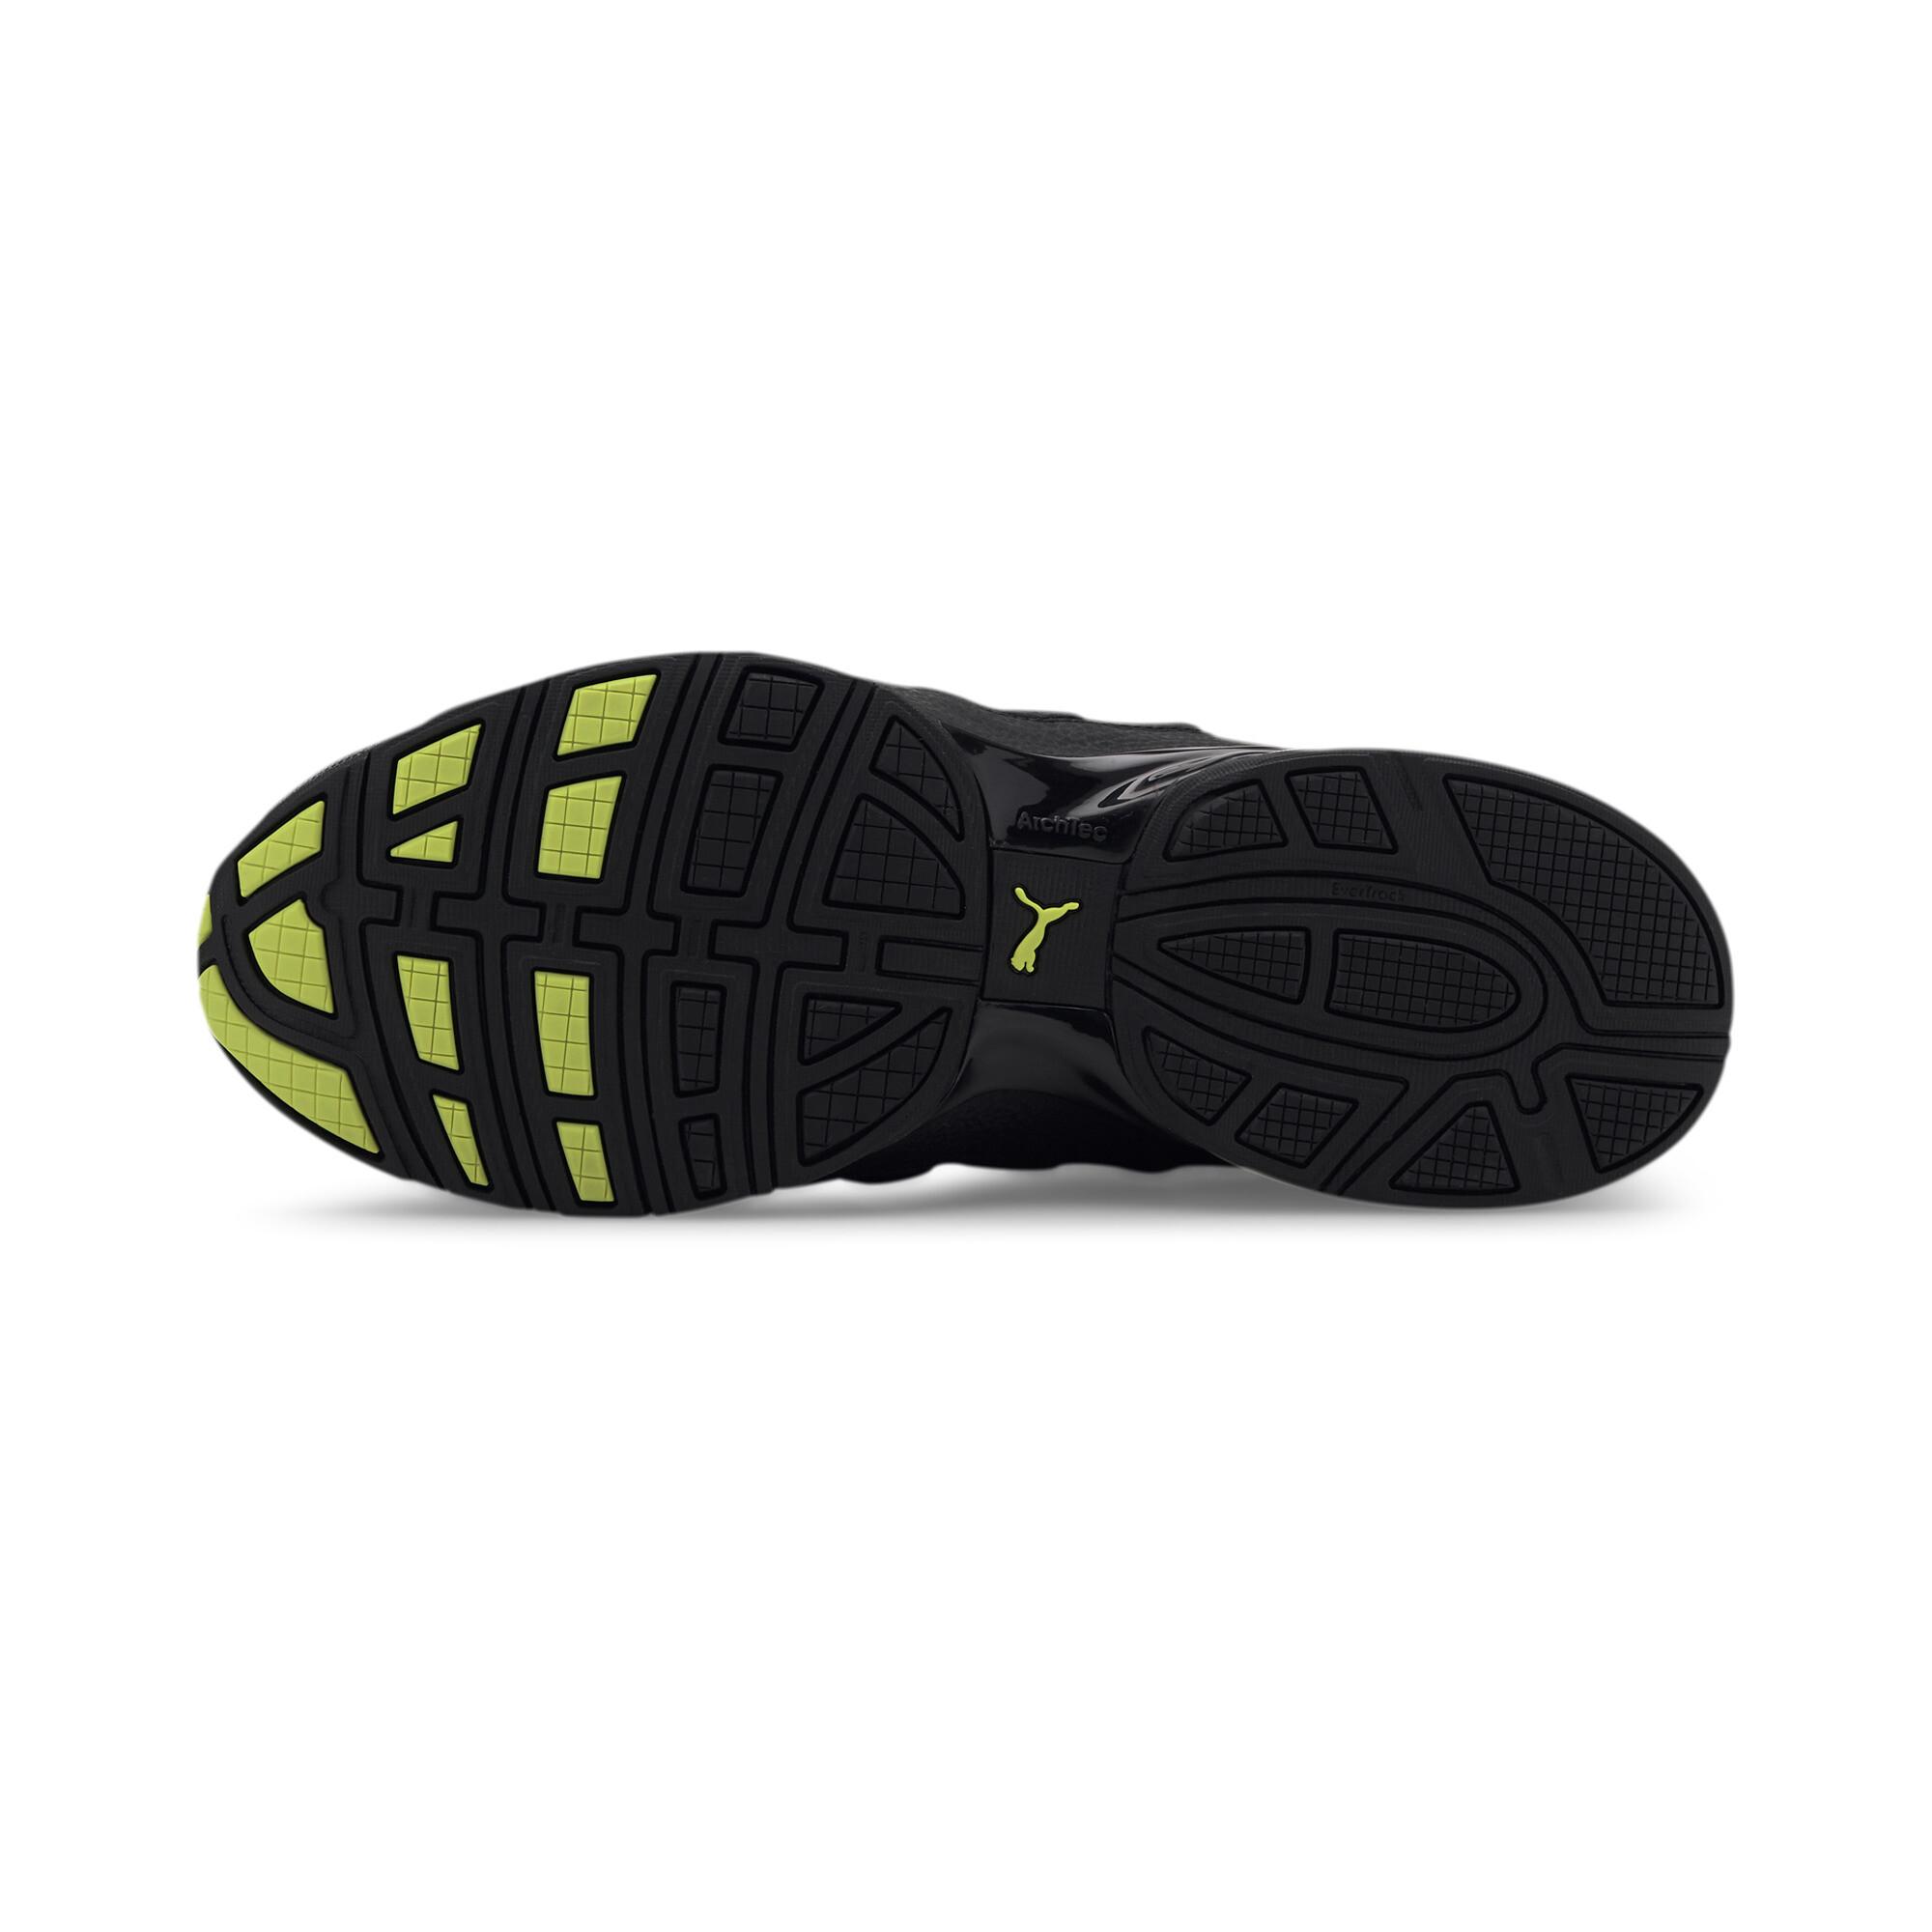 PUMA-Men-039-s-CELL-Regulate-Bold-Training-Shoes thumbnail 20